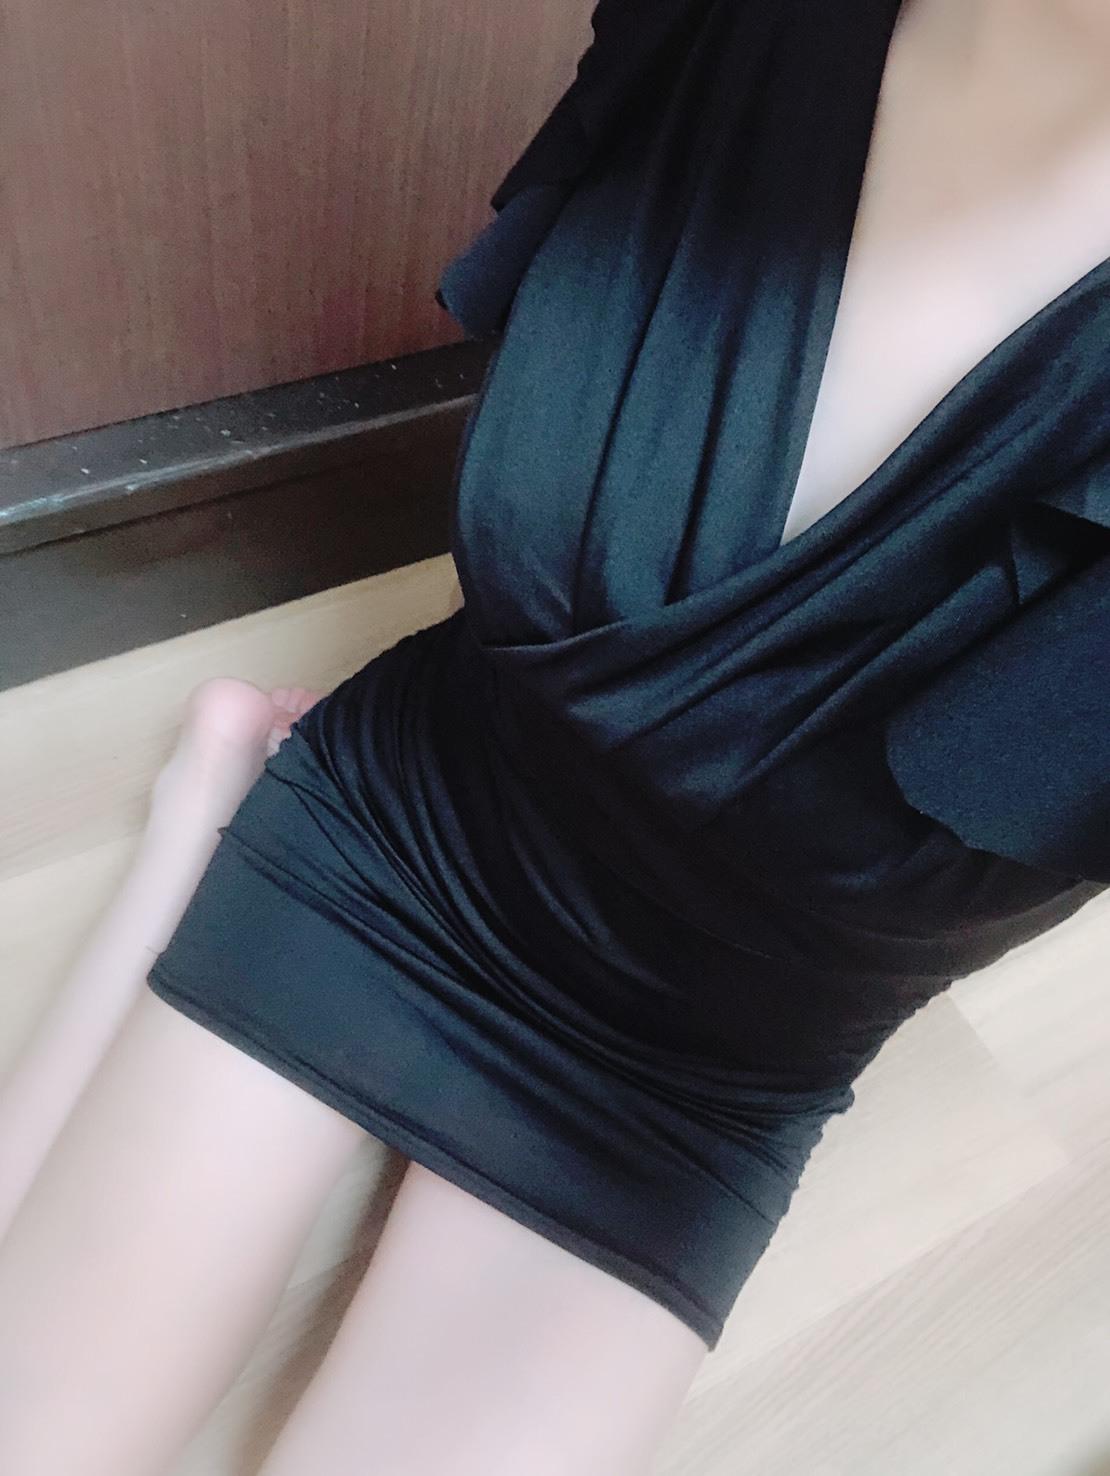 S__32694276.jpg